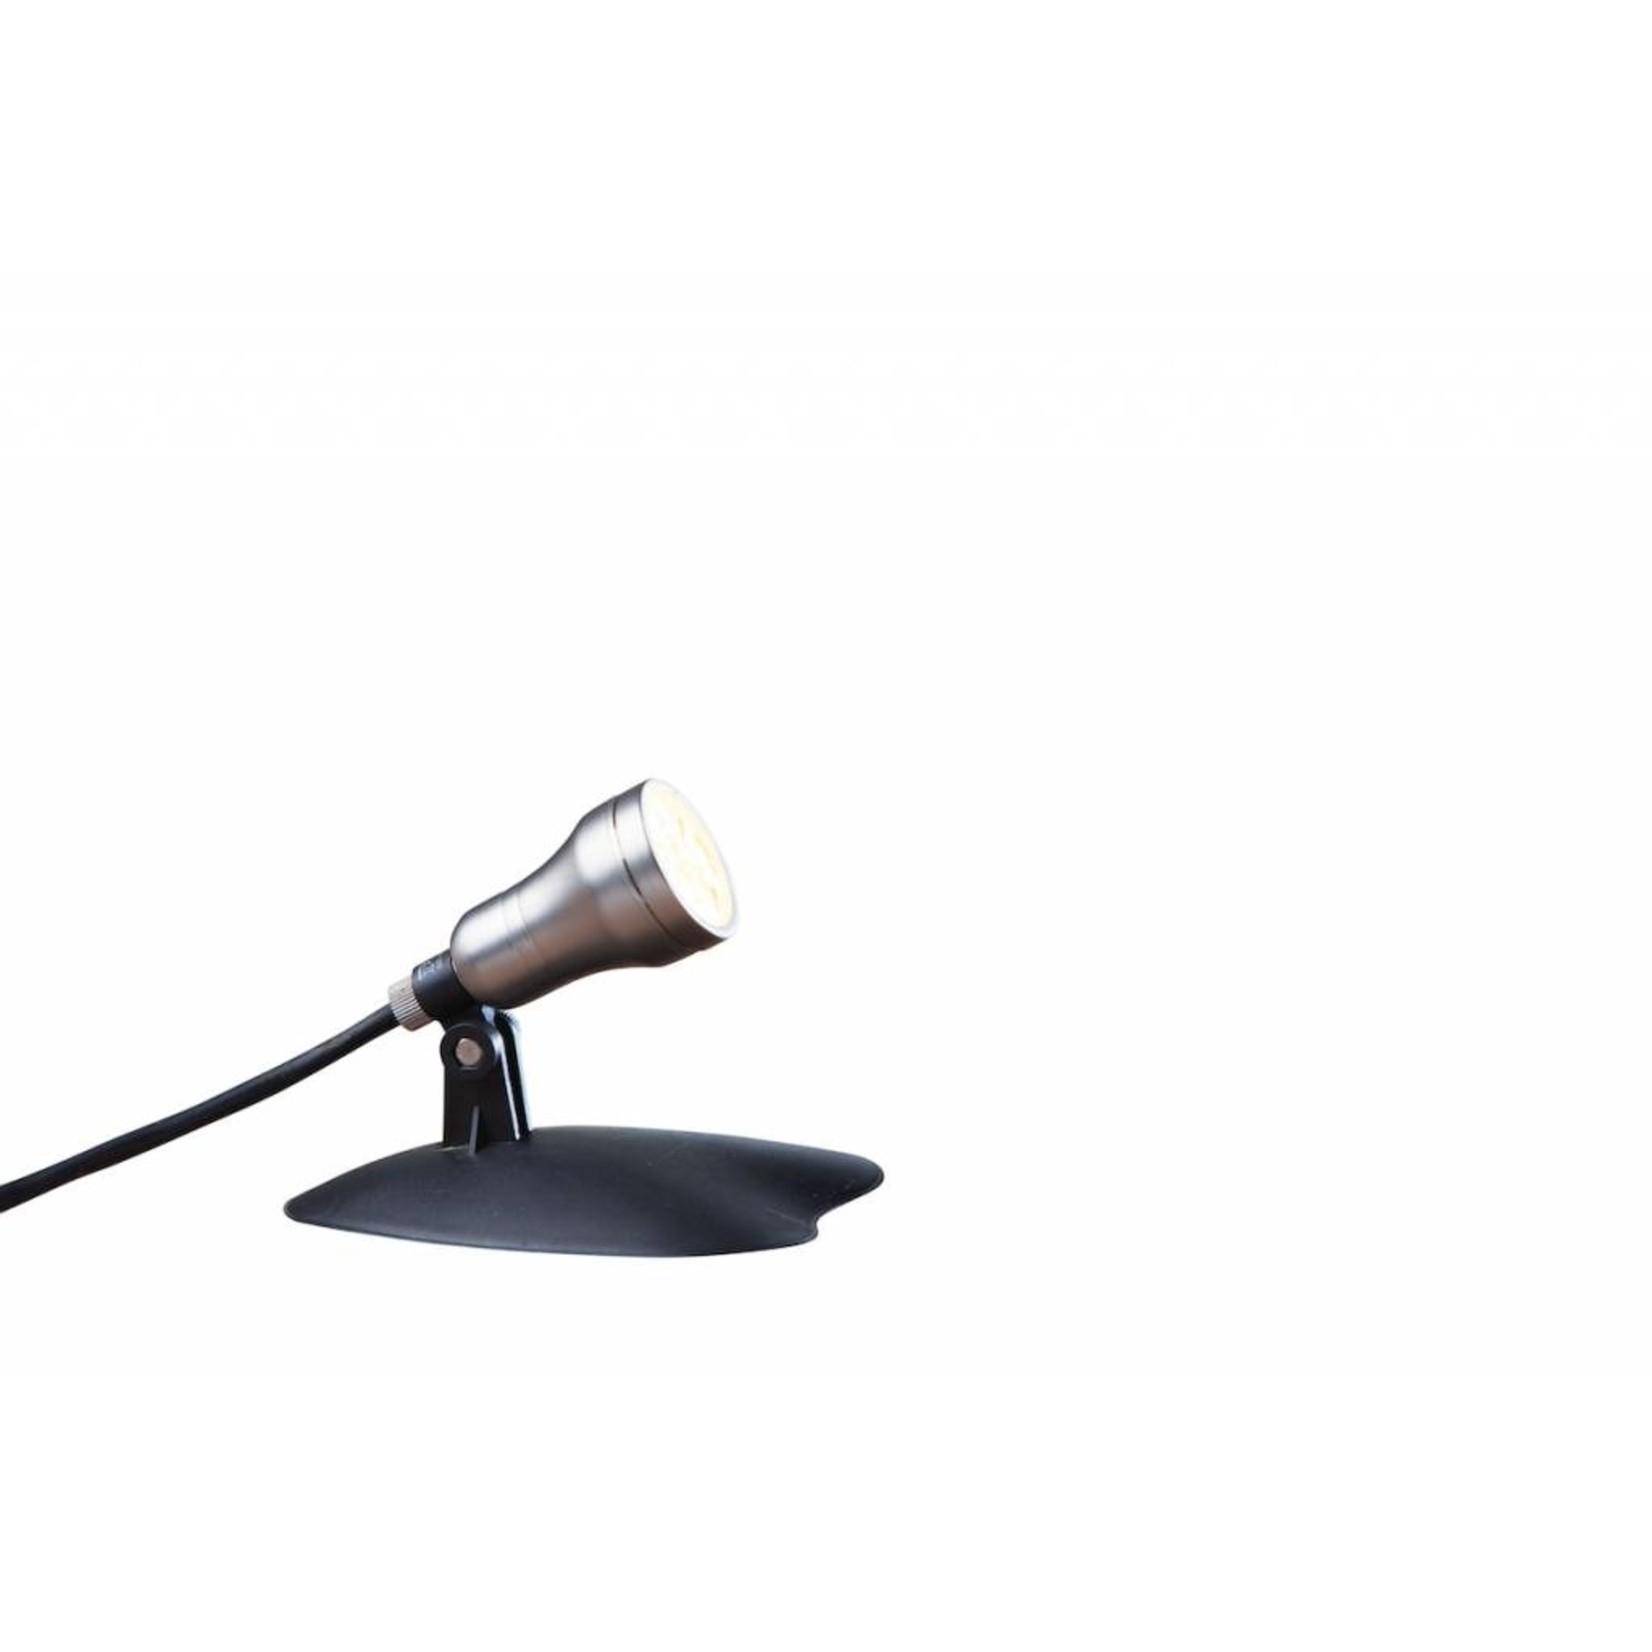 Heissner Smart Light spot 4W warm wit metaal